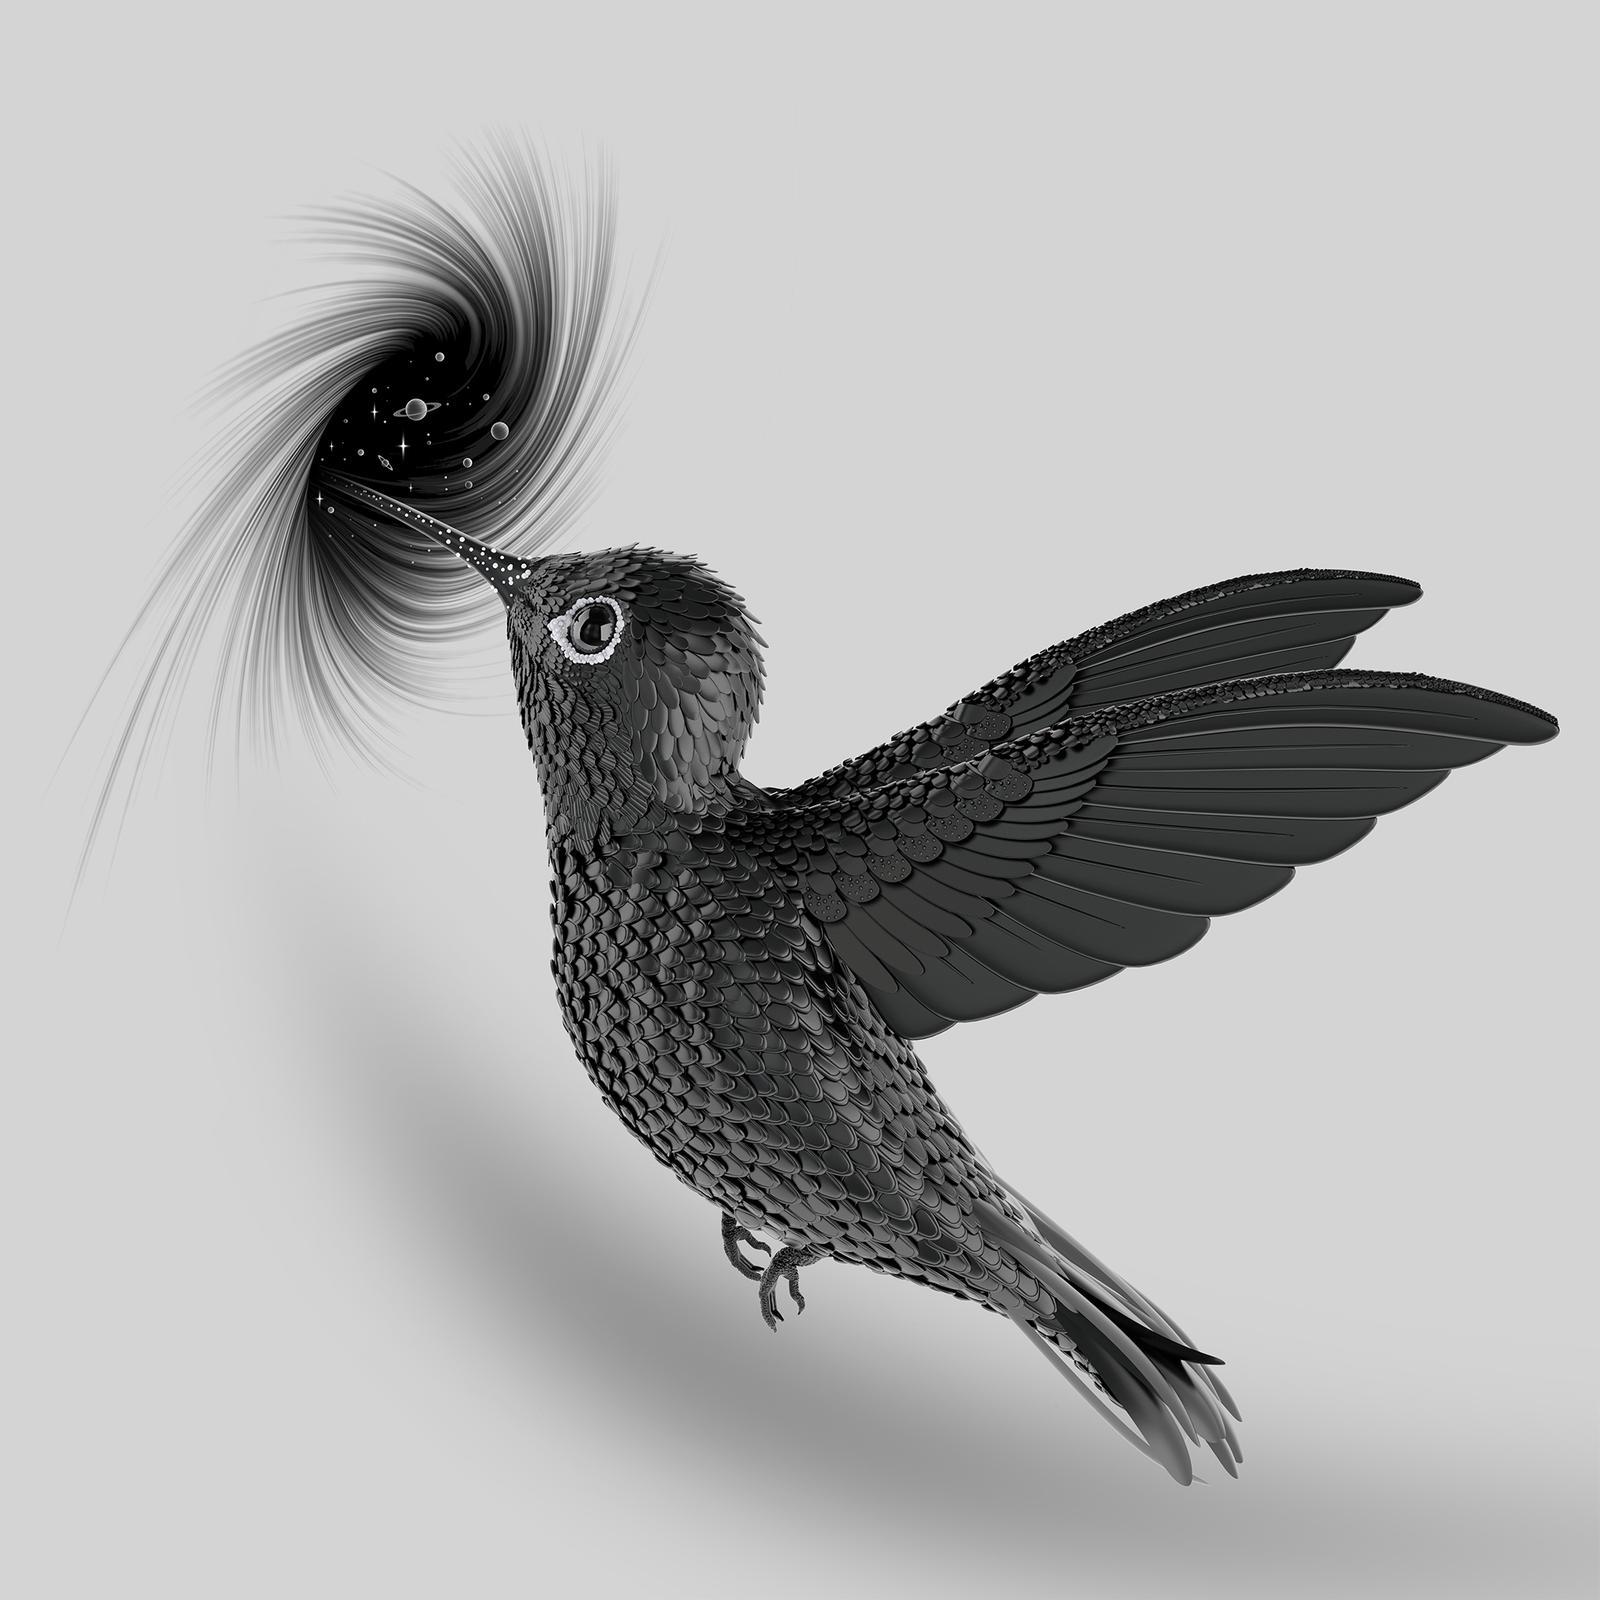 Blackbird 2 by Ethernity